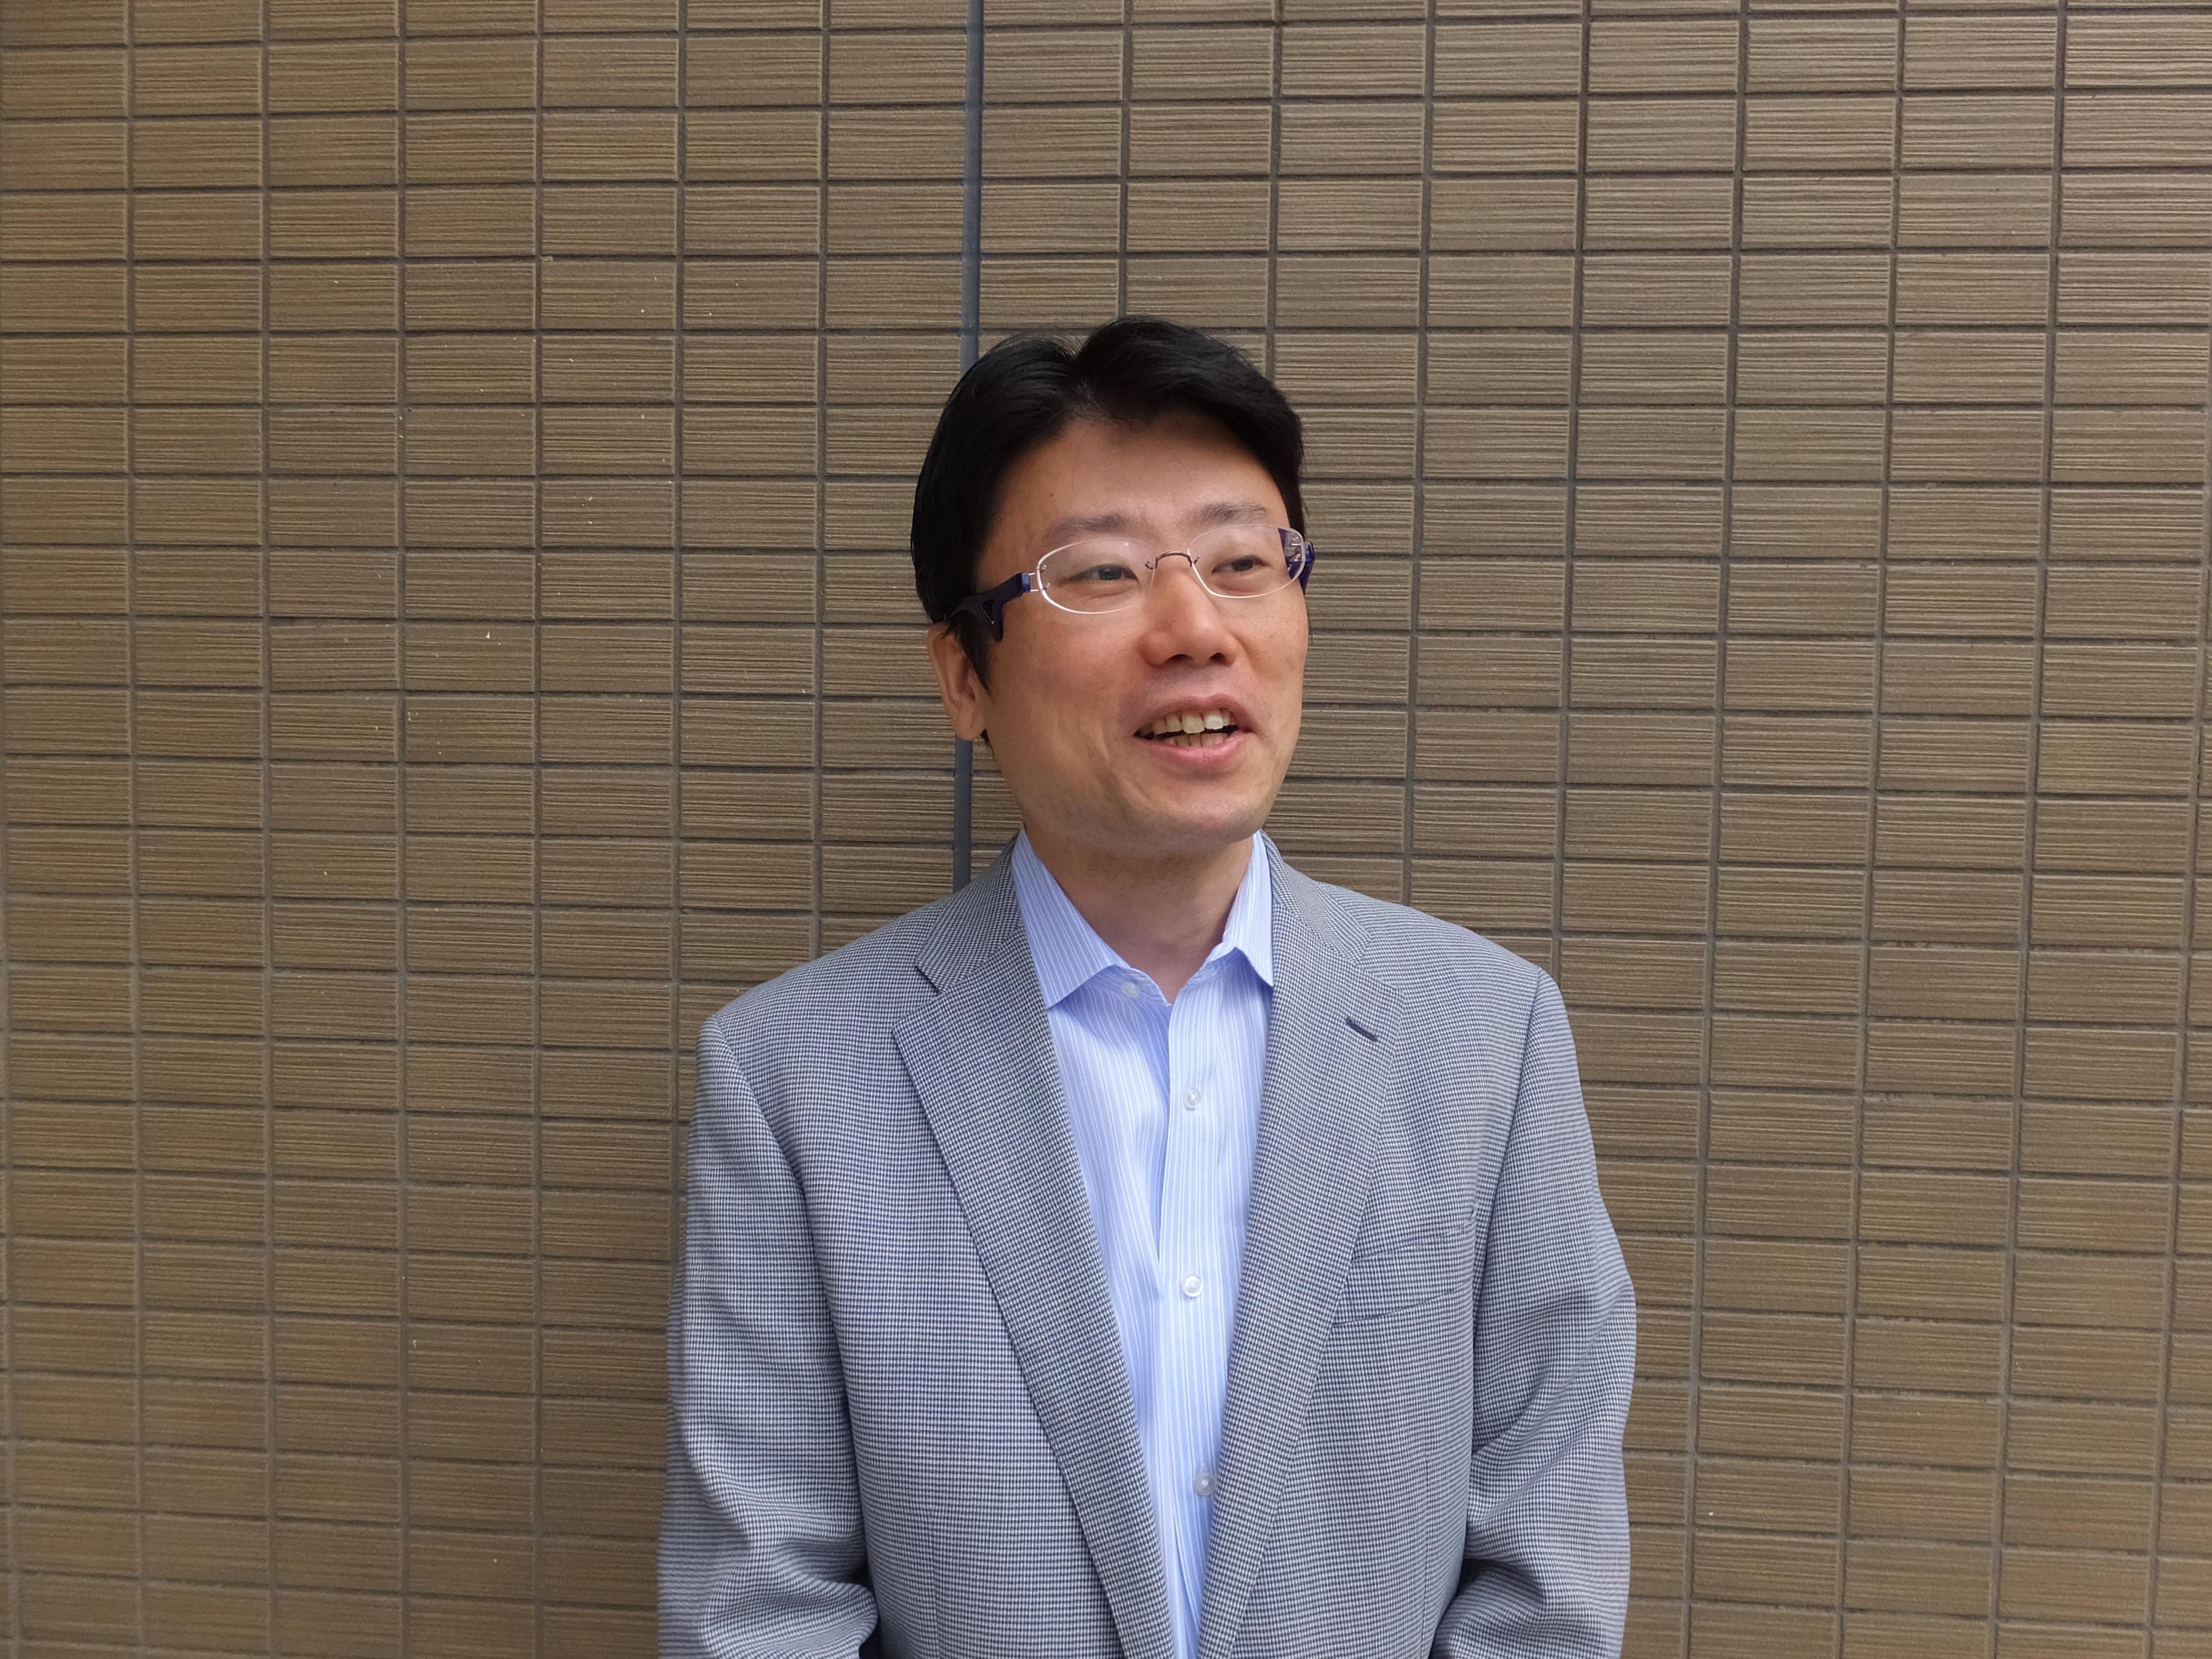 hayashibara.JPG